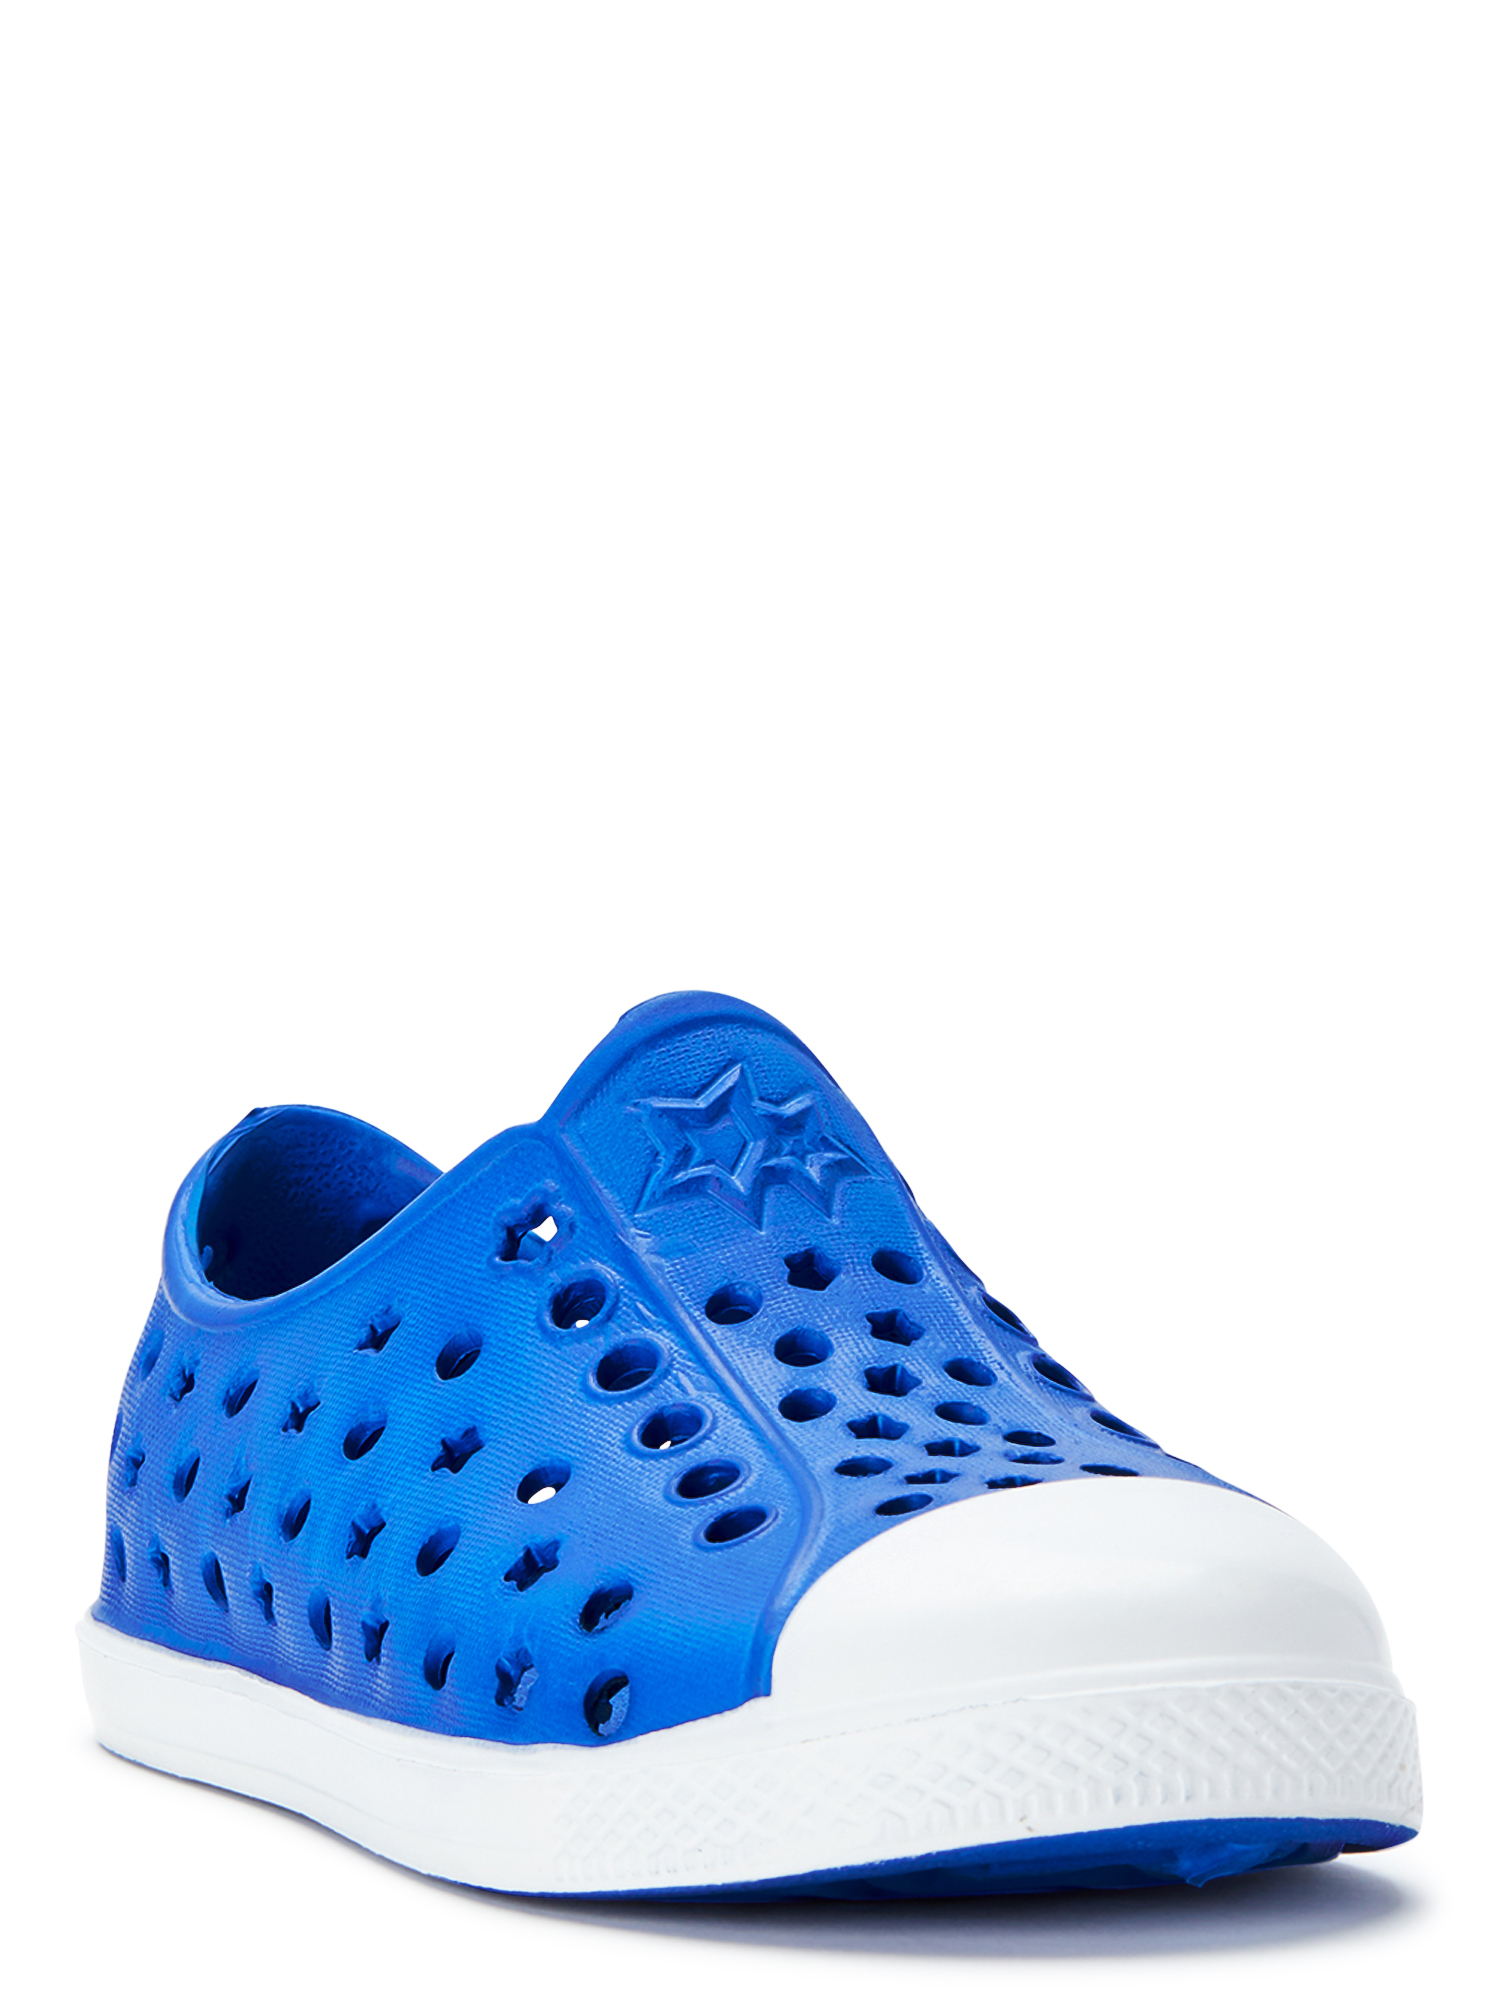 NEW Boys Water Shoes Kids Medium 13-1 Black Sandals Clogs Slip On Summer Pool